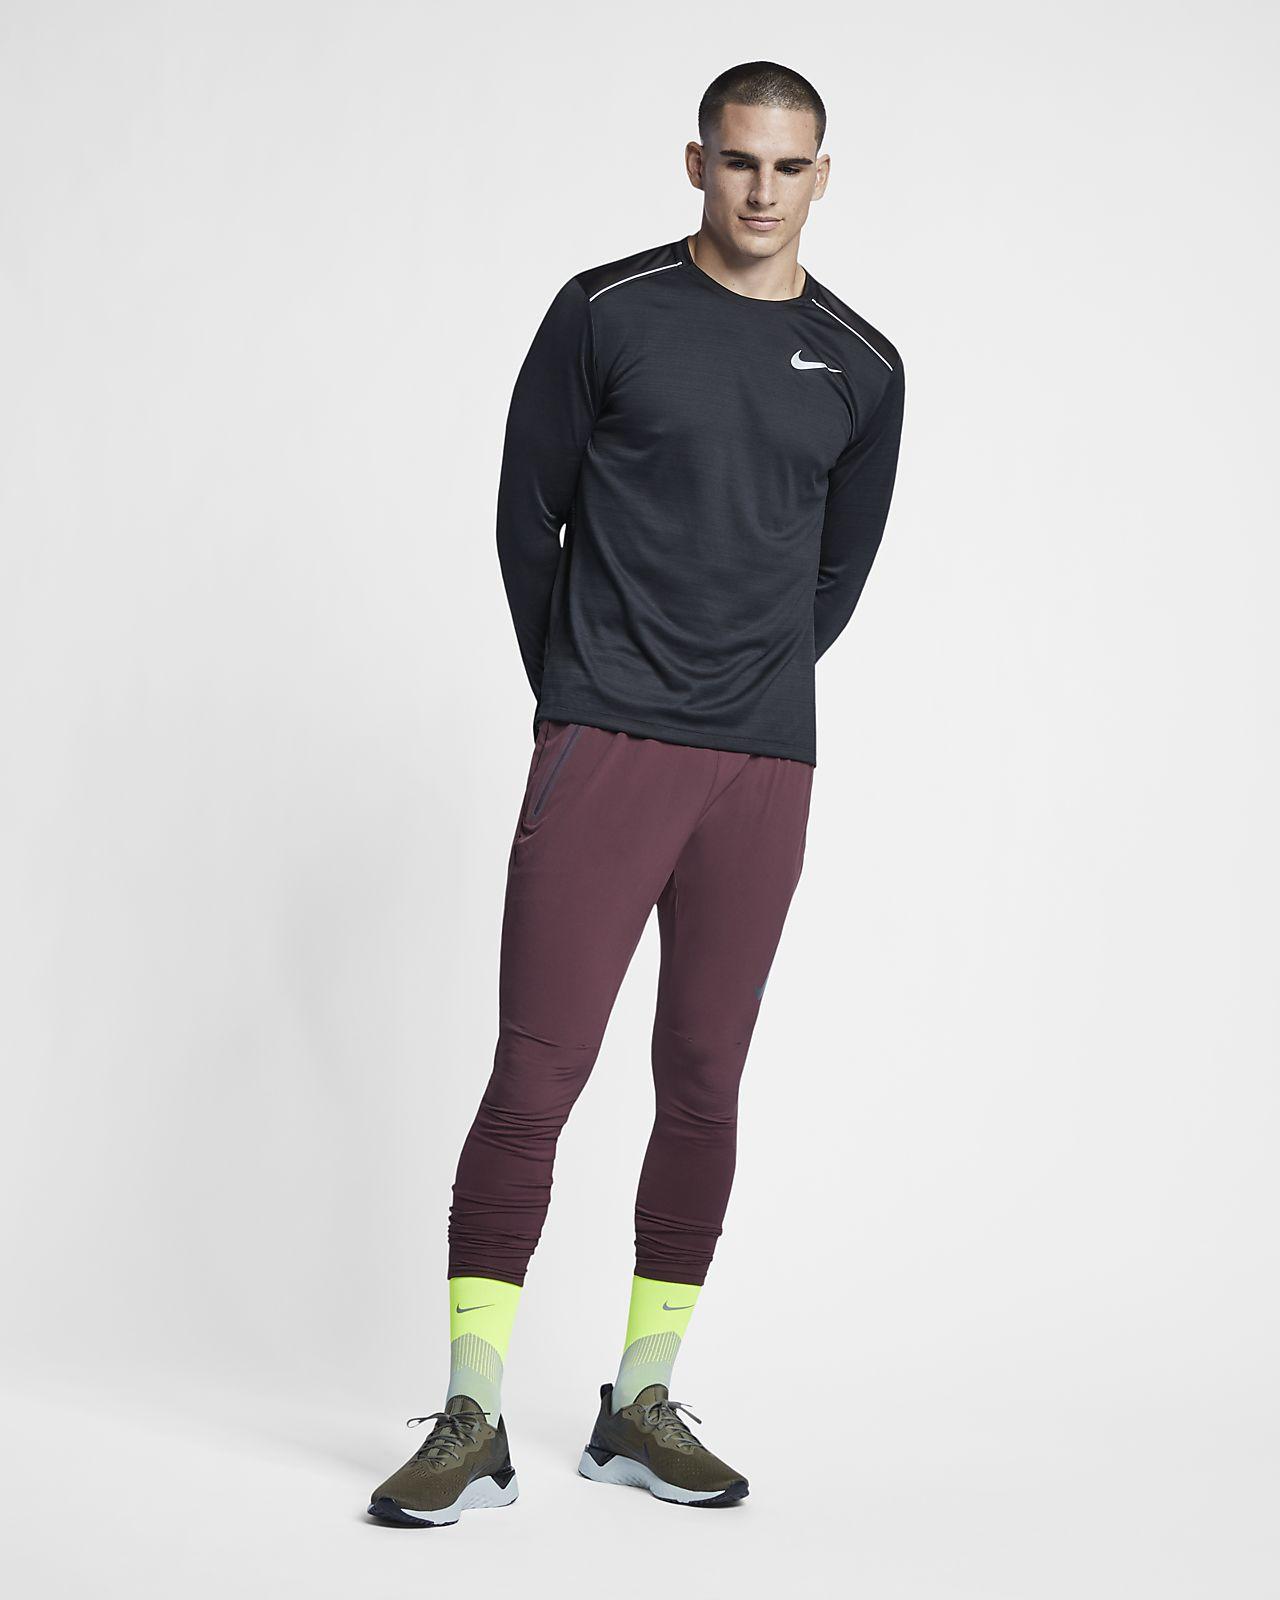 Camisola de running de manga comprida Nike Dri FIT Miler para homem